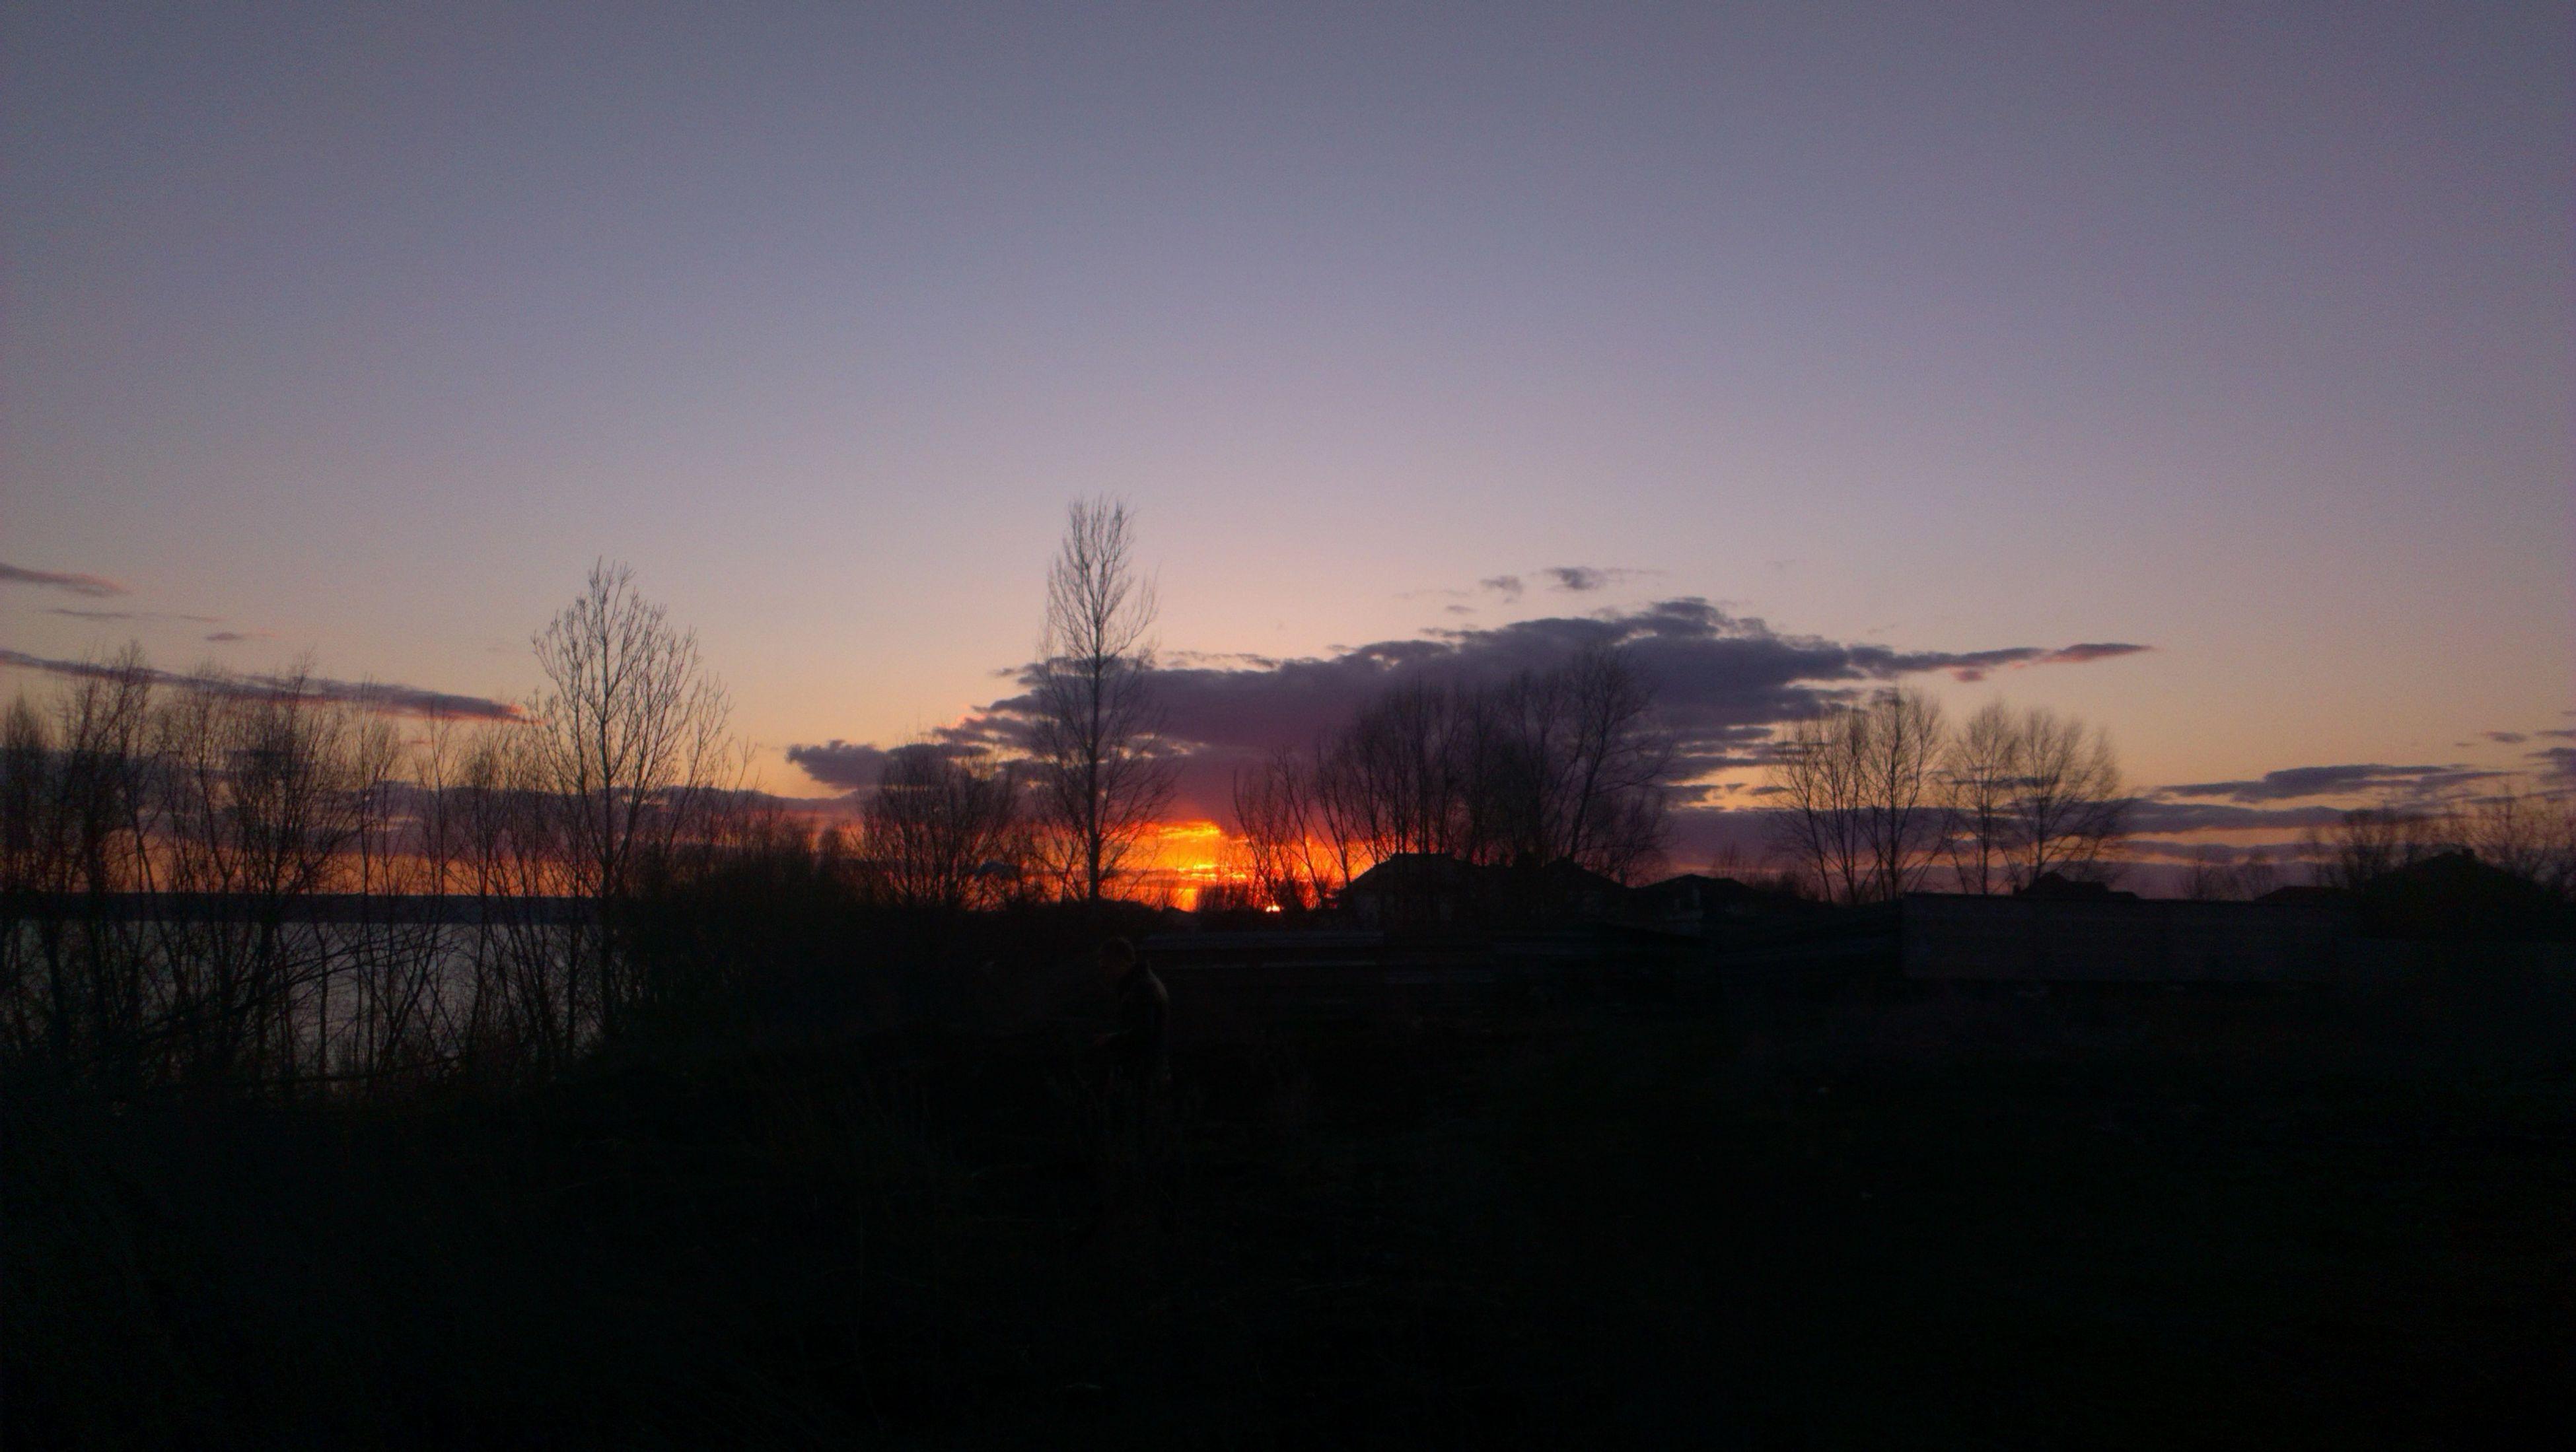 sunset, silhouette, tranquil scene, copy space, tranquility, scenics, clear sky, bare tree, beauty in nature, landscape, orange color, nature, dark, tree, sky, sun, idyllic, dusk, field, outline